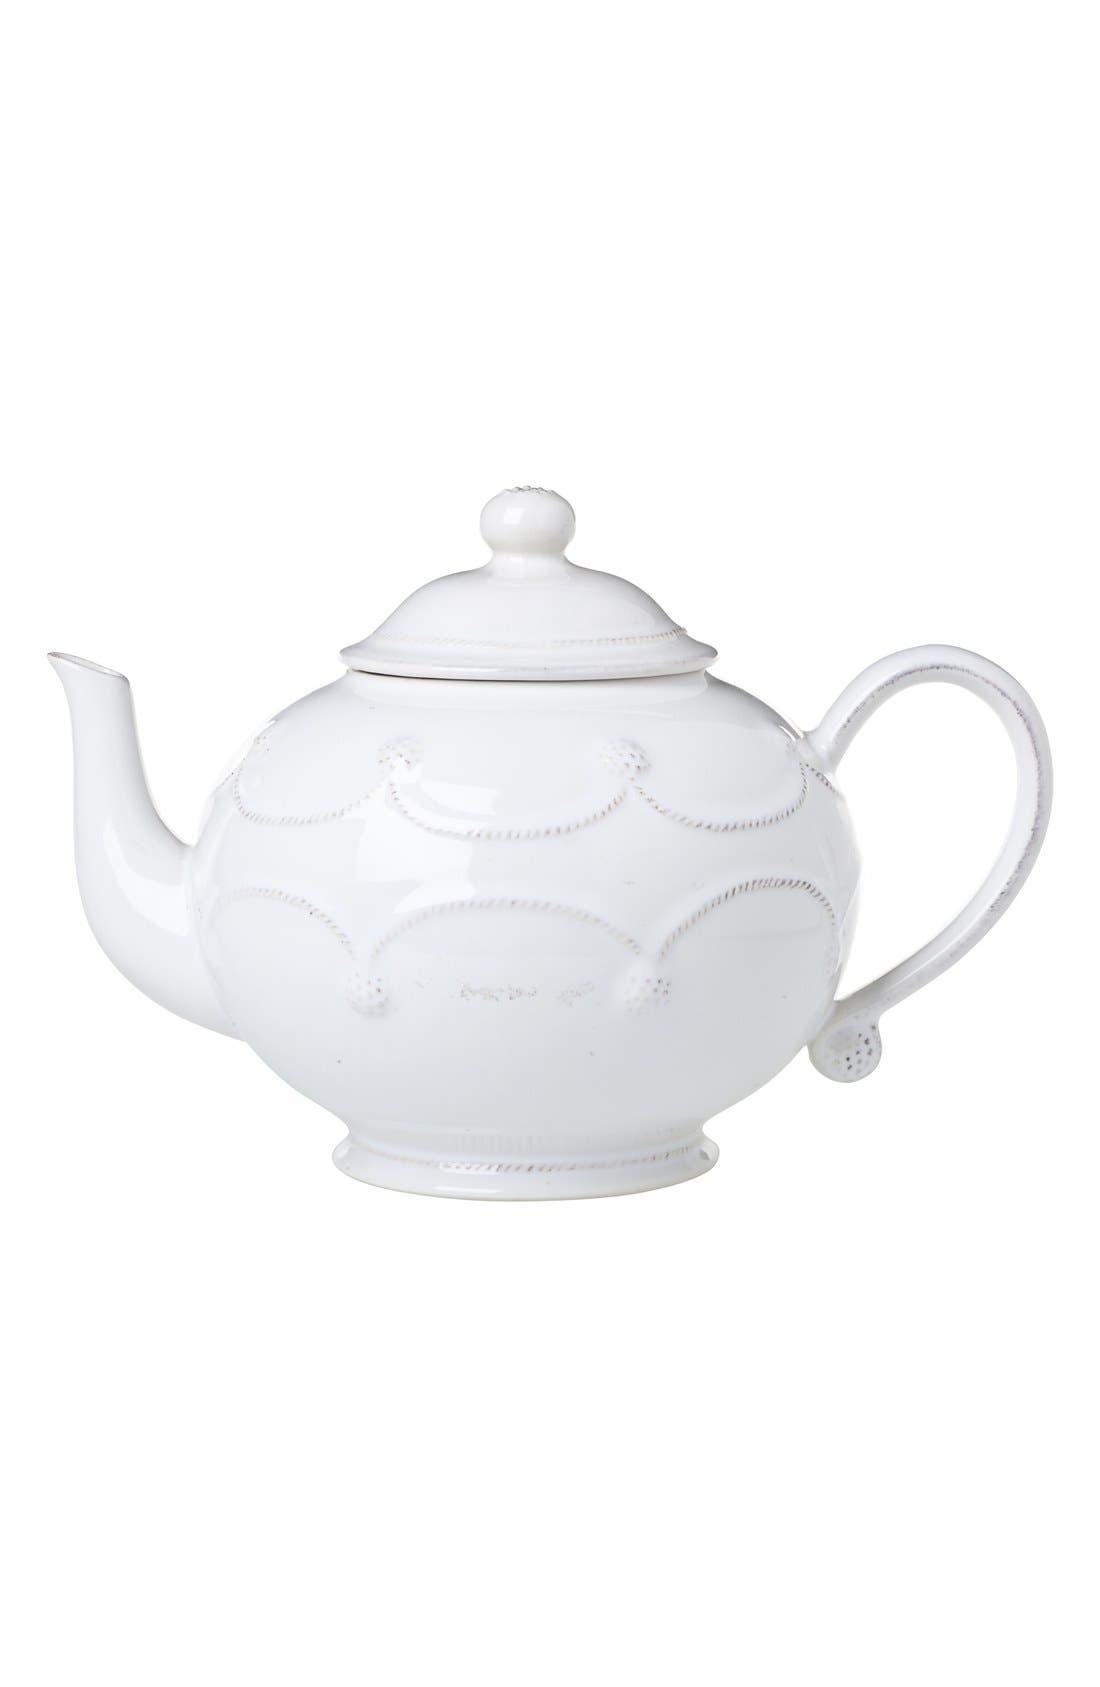 Juliska'Berry and Thread' Ceramic Teapot